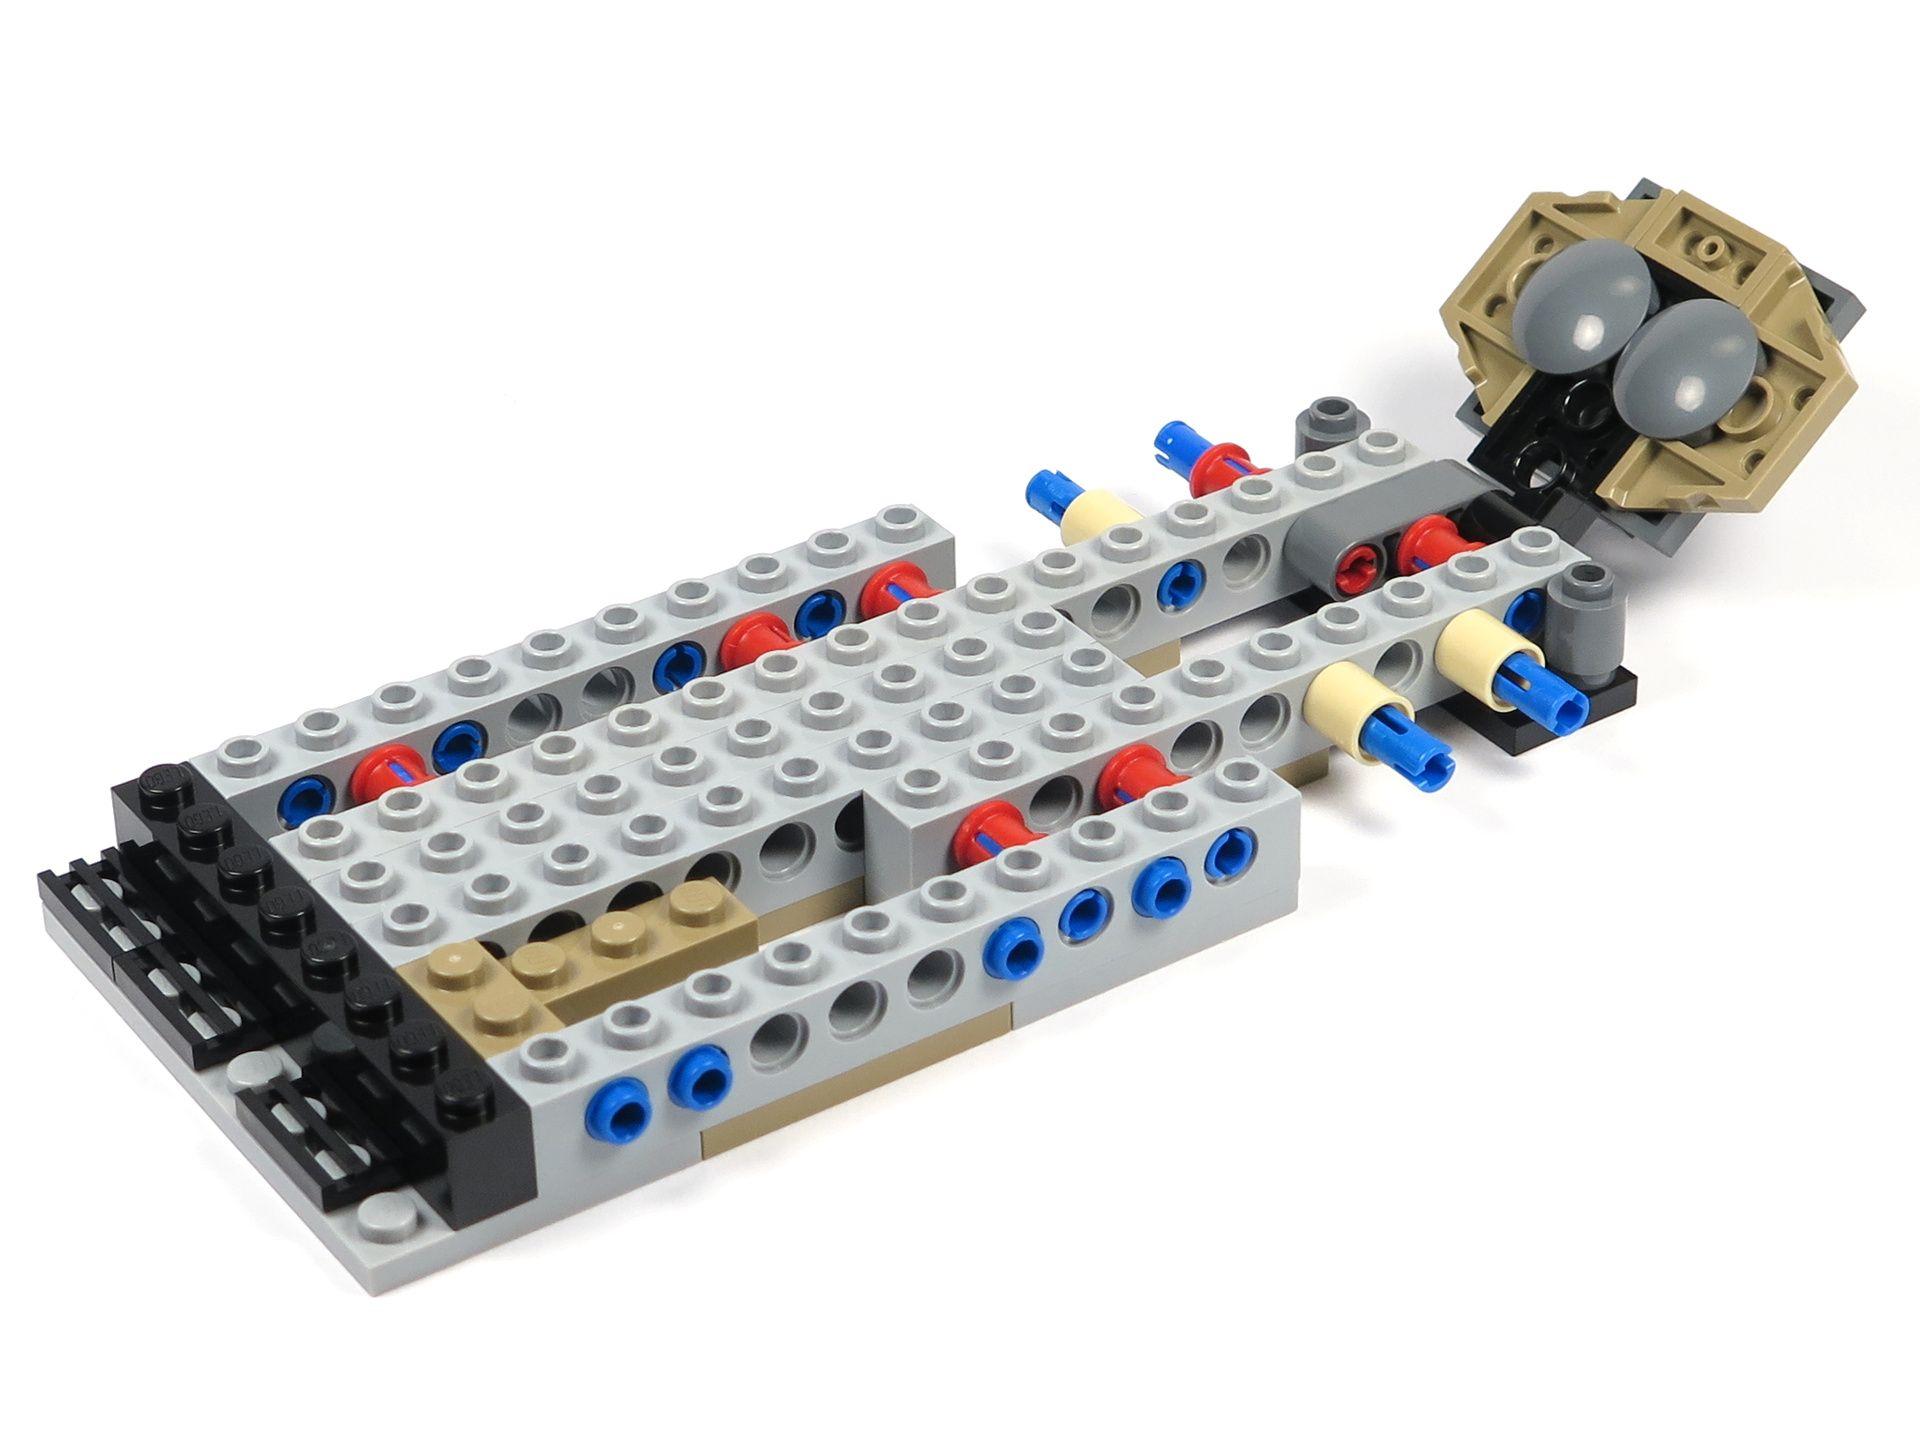 LEGO® Star Wars™ Moloch's Landspeeder™ (75210) - Bauabschnitt 1 - links | ©2018 Brickzeit